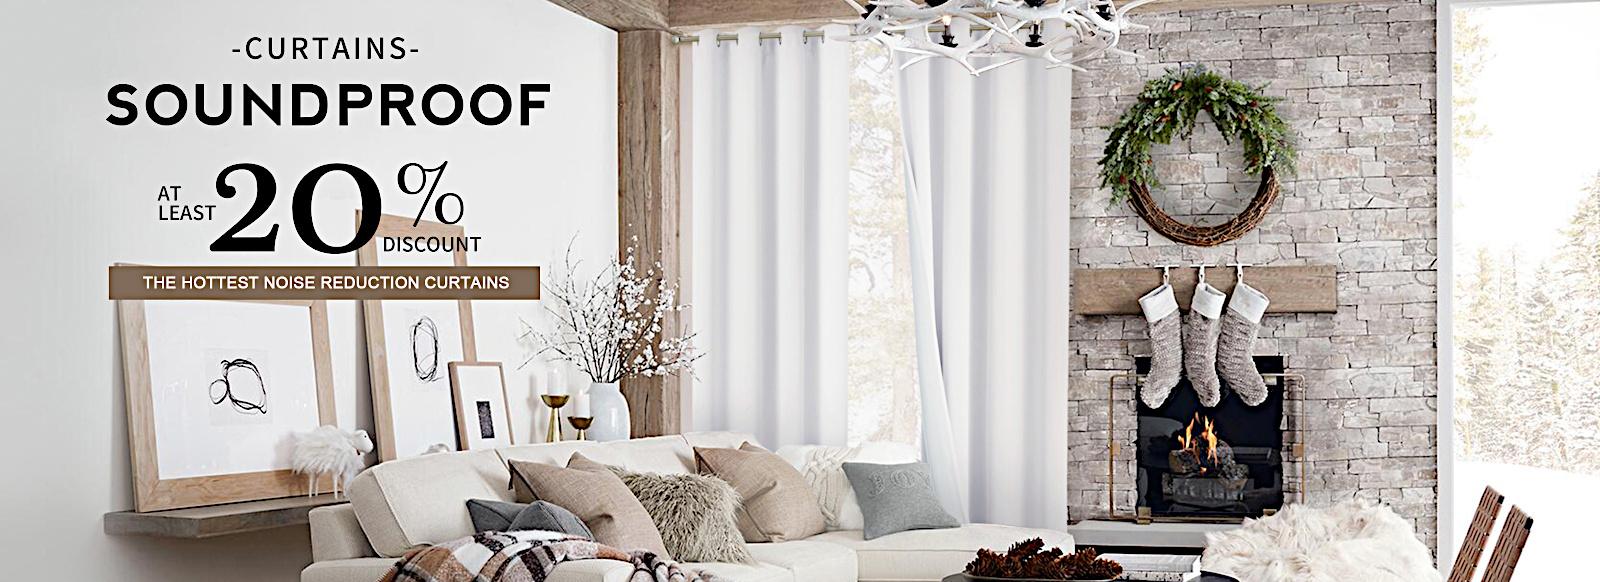 Optimal custom made blackout, soundproof, waterproof curtains